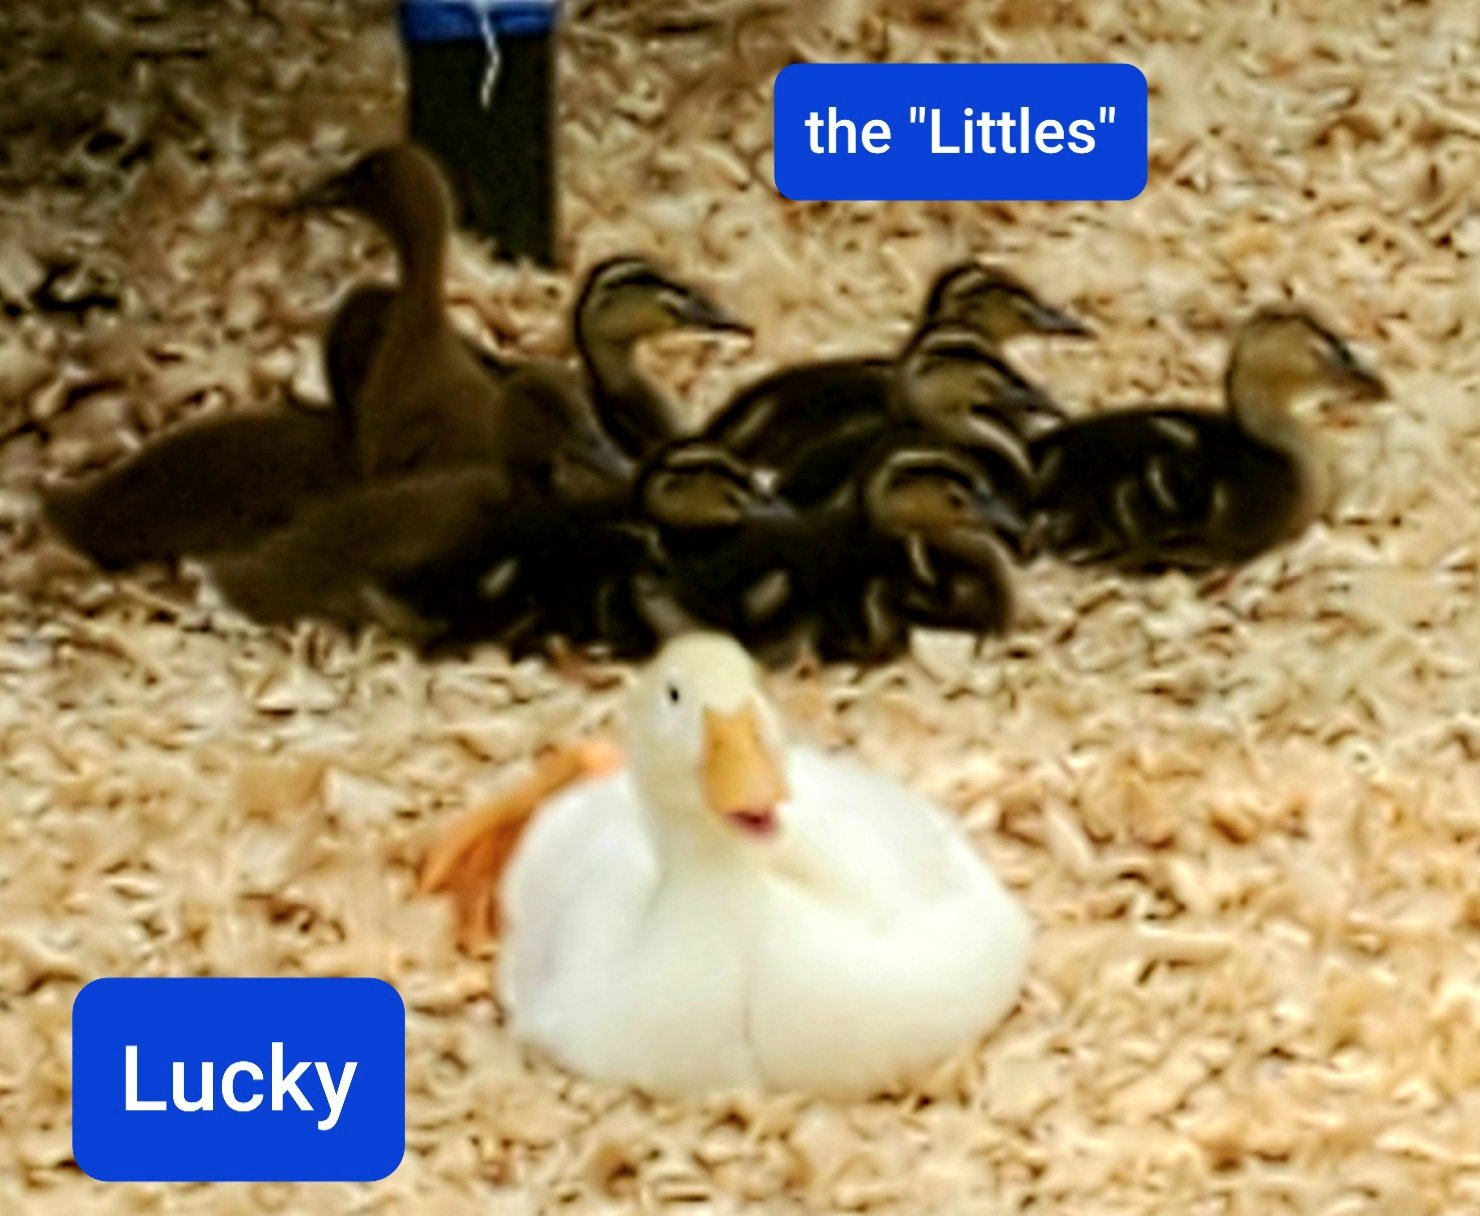 LuckyLittles.jpg